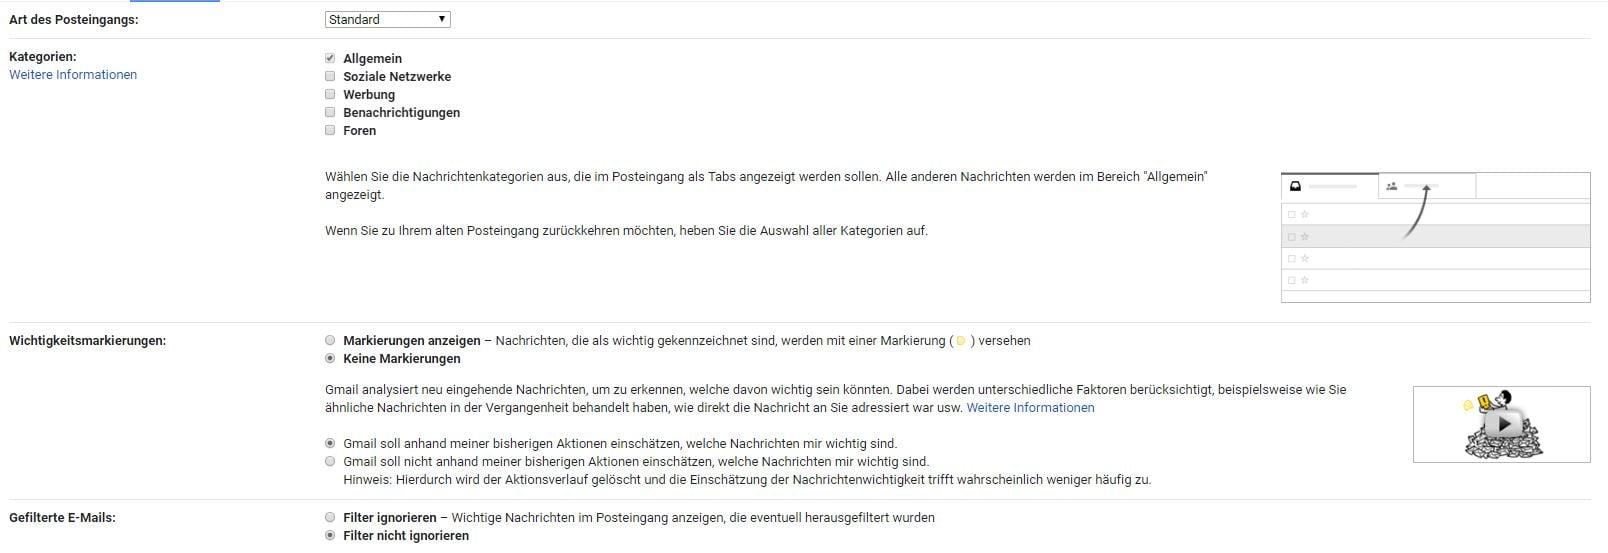 HubSpot-Filter-nicht-ignorieren